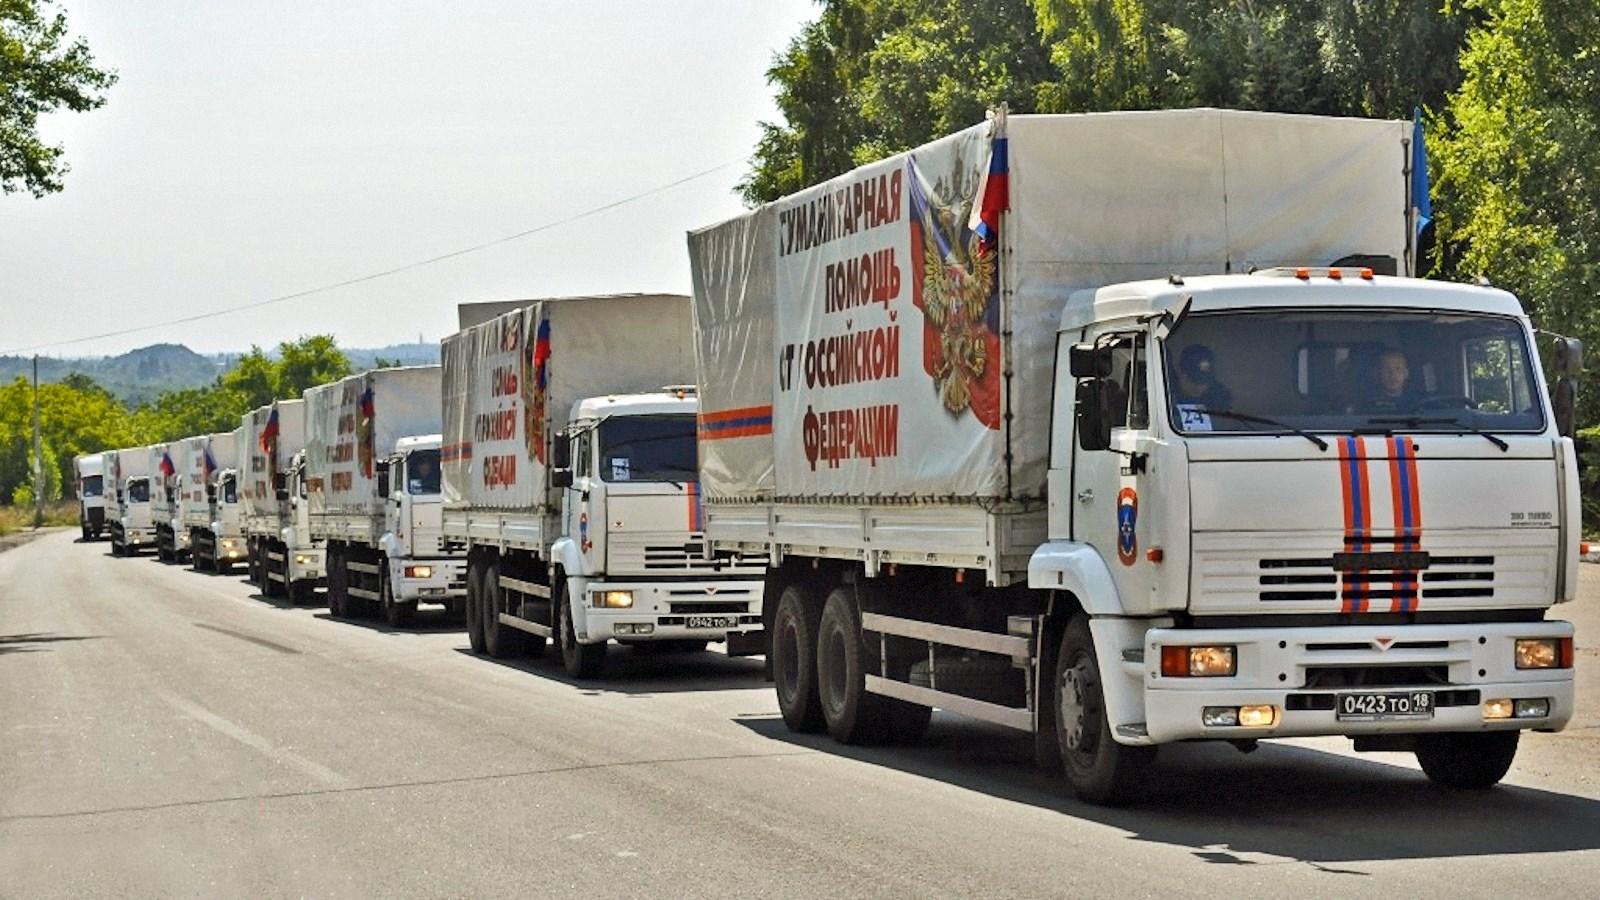 00 33rd MChS Humanitarian Convoy 01. 230715